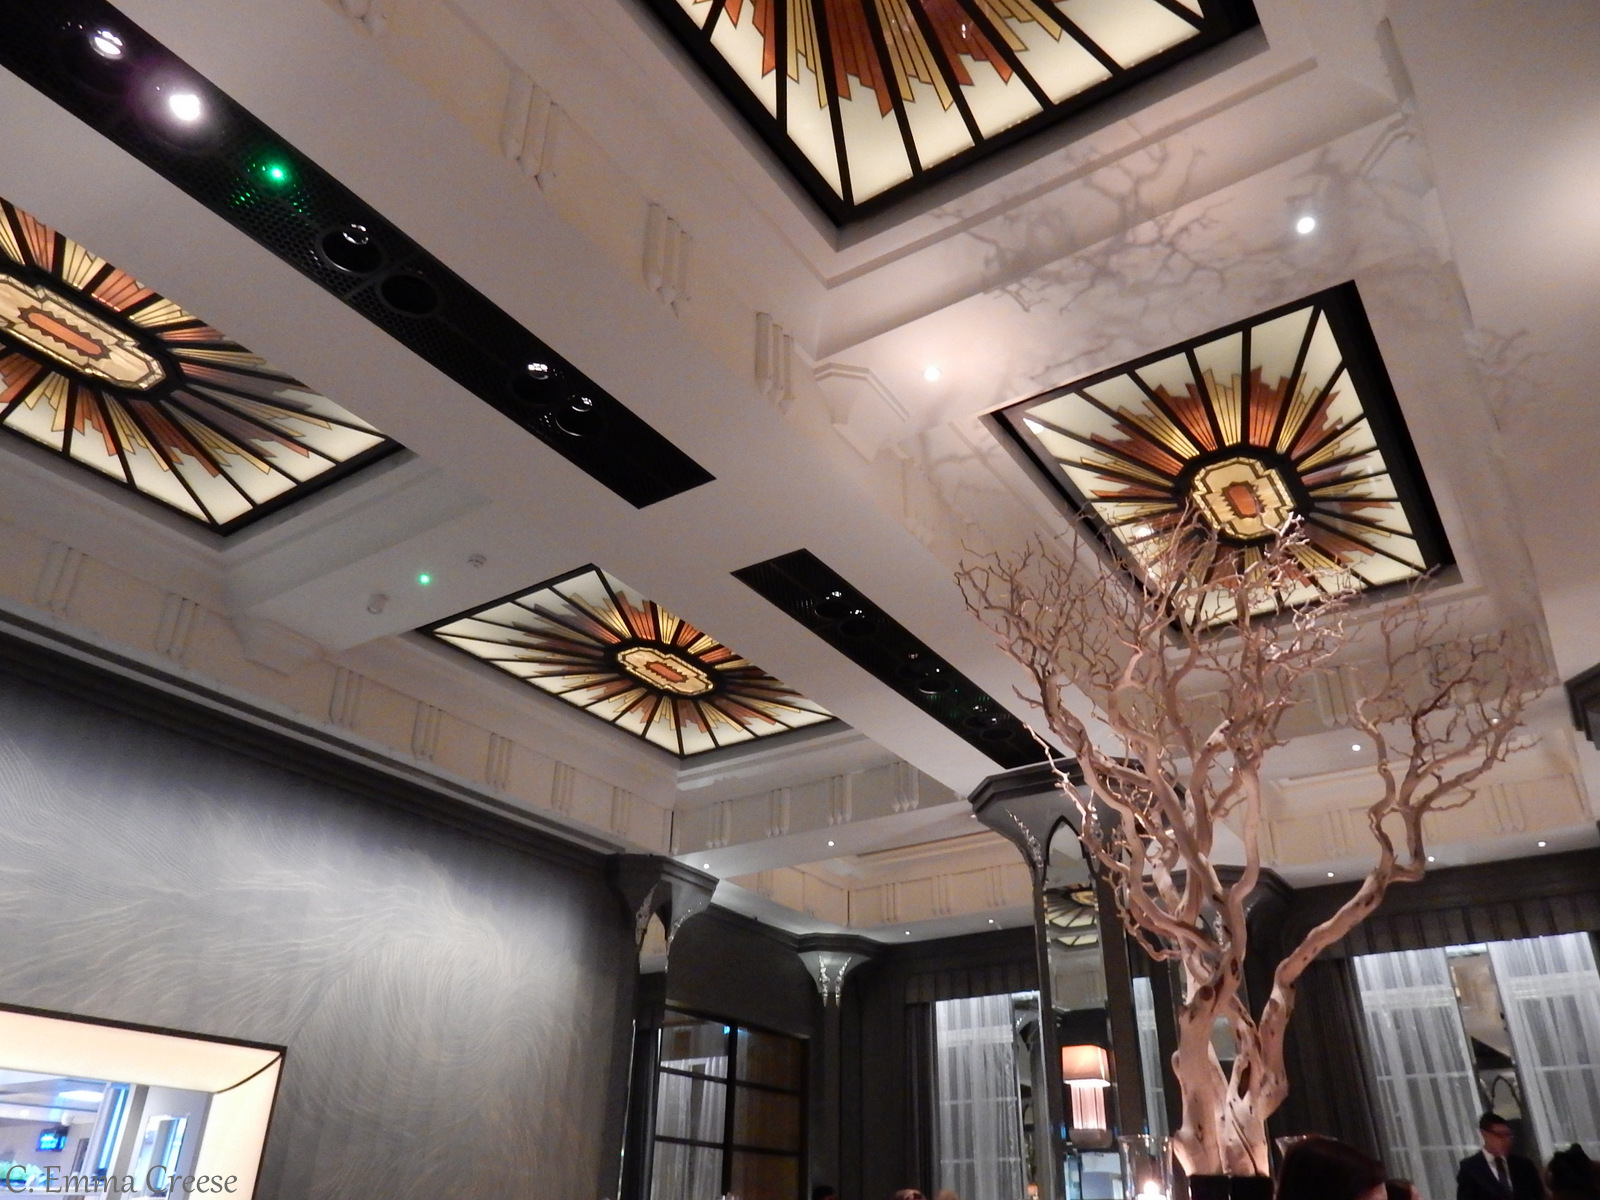 Fera Claridge's restaurant review